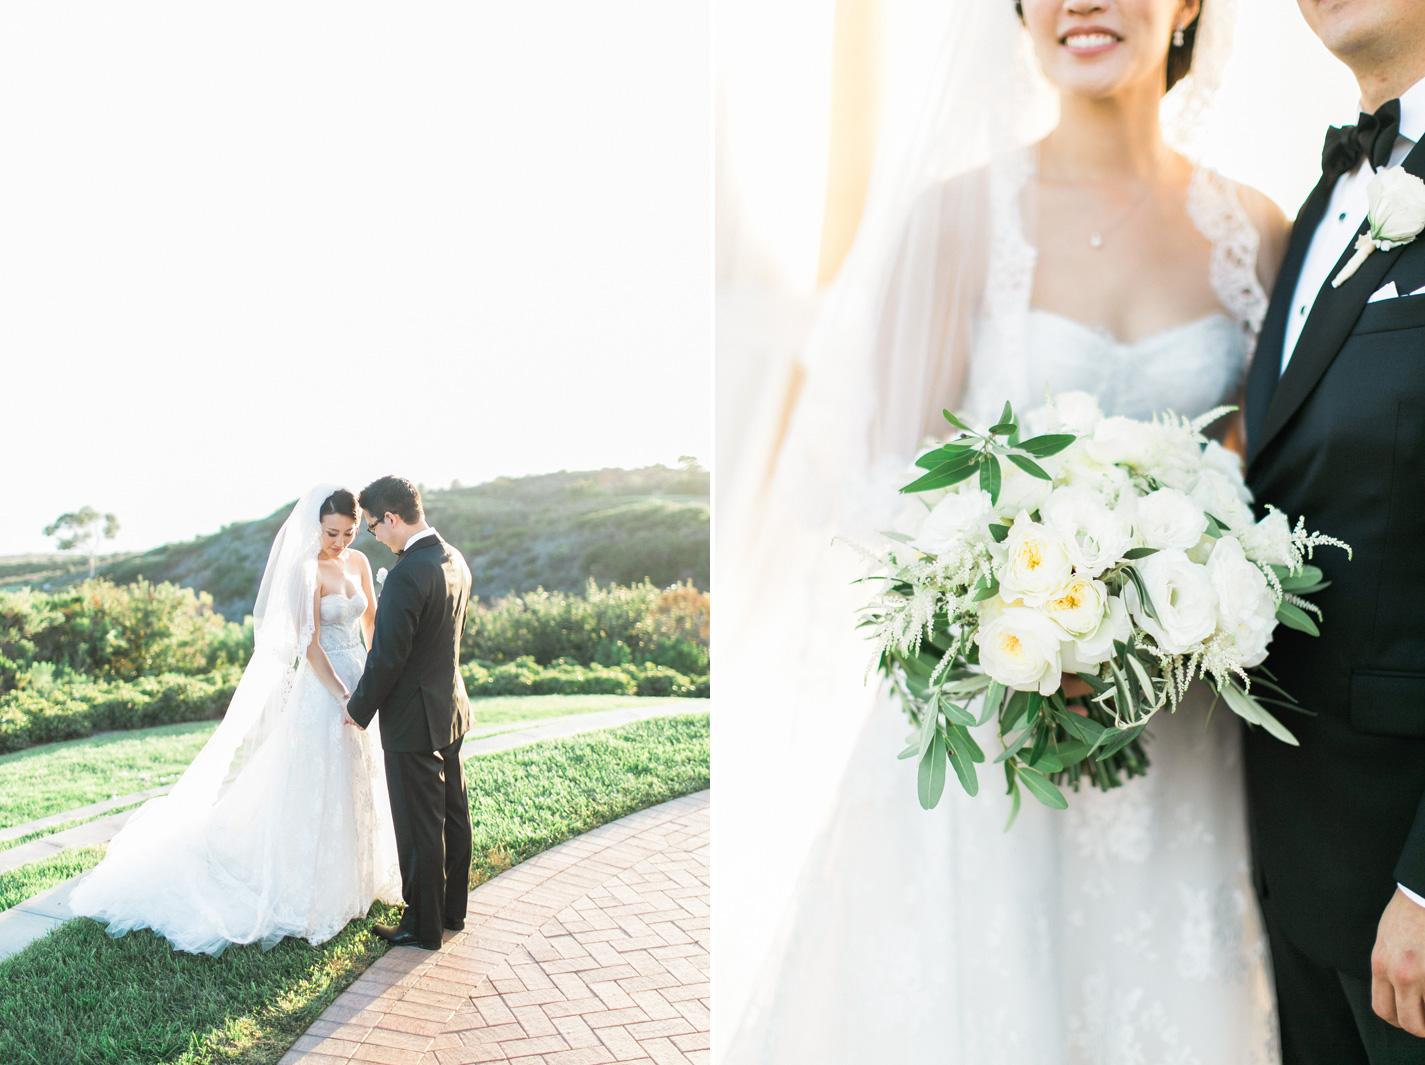 Pelican-hill-wedding-30